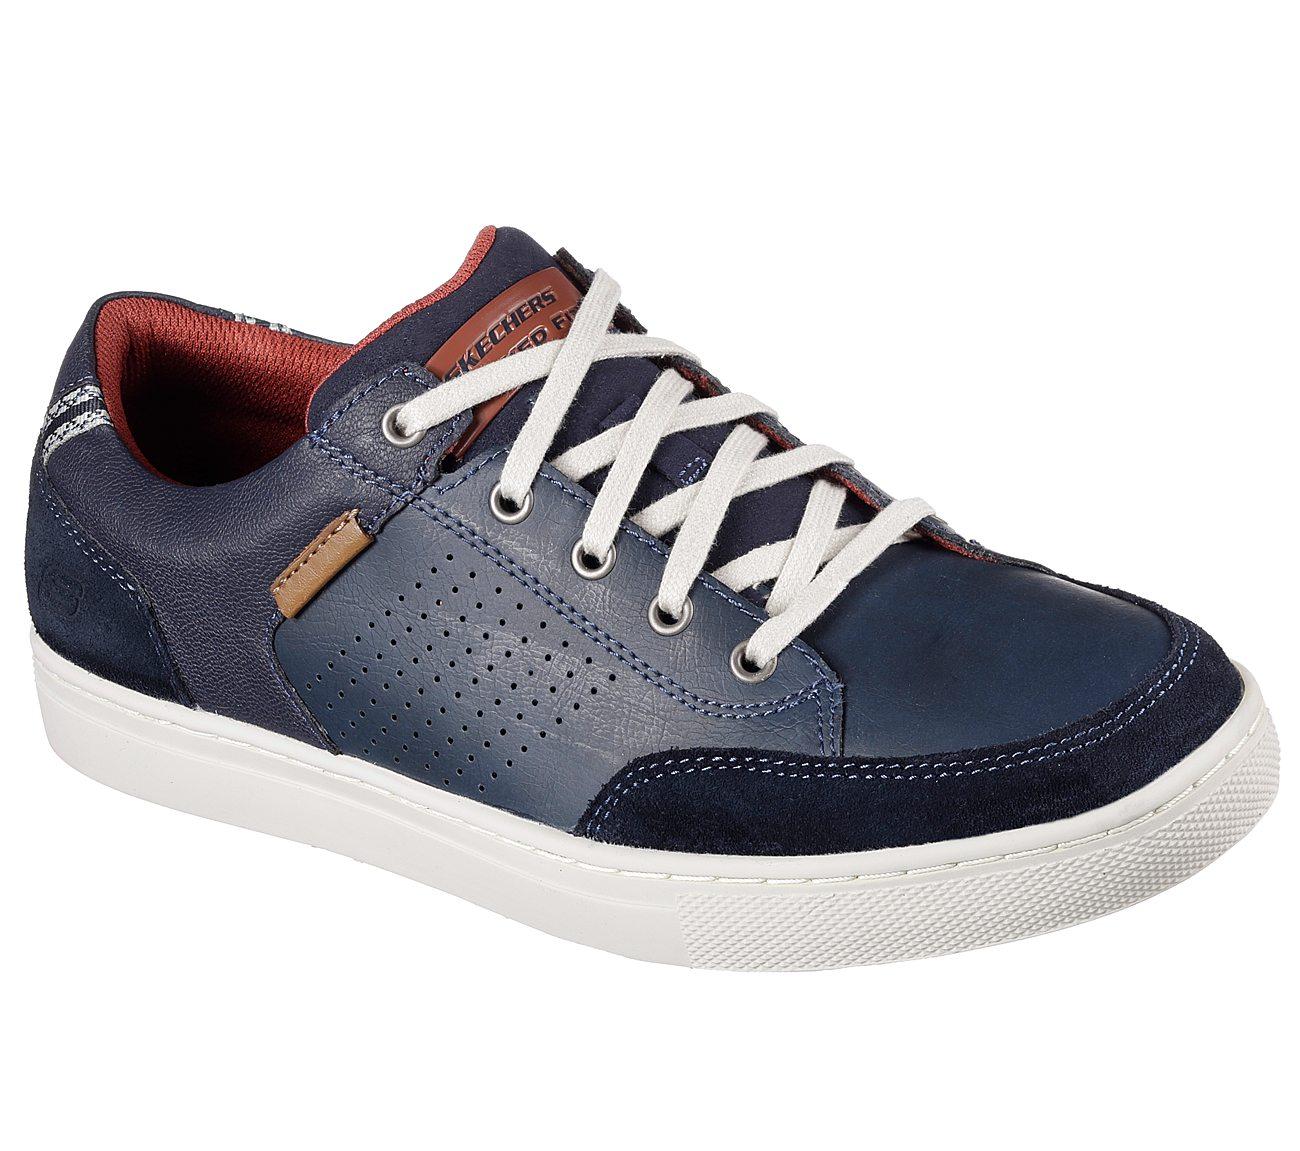 98bd5609 Buy SKECHERS Relaxed Fit: Elvino - Lemen SKECHERS Relaxed Fit Shoes ...